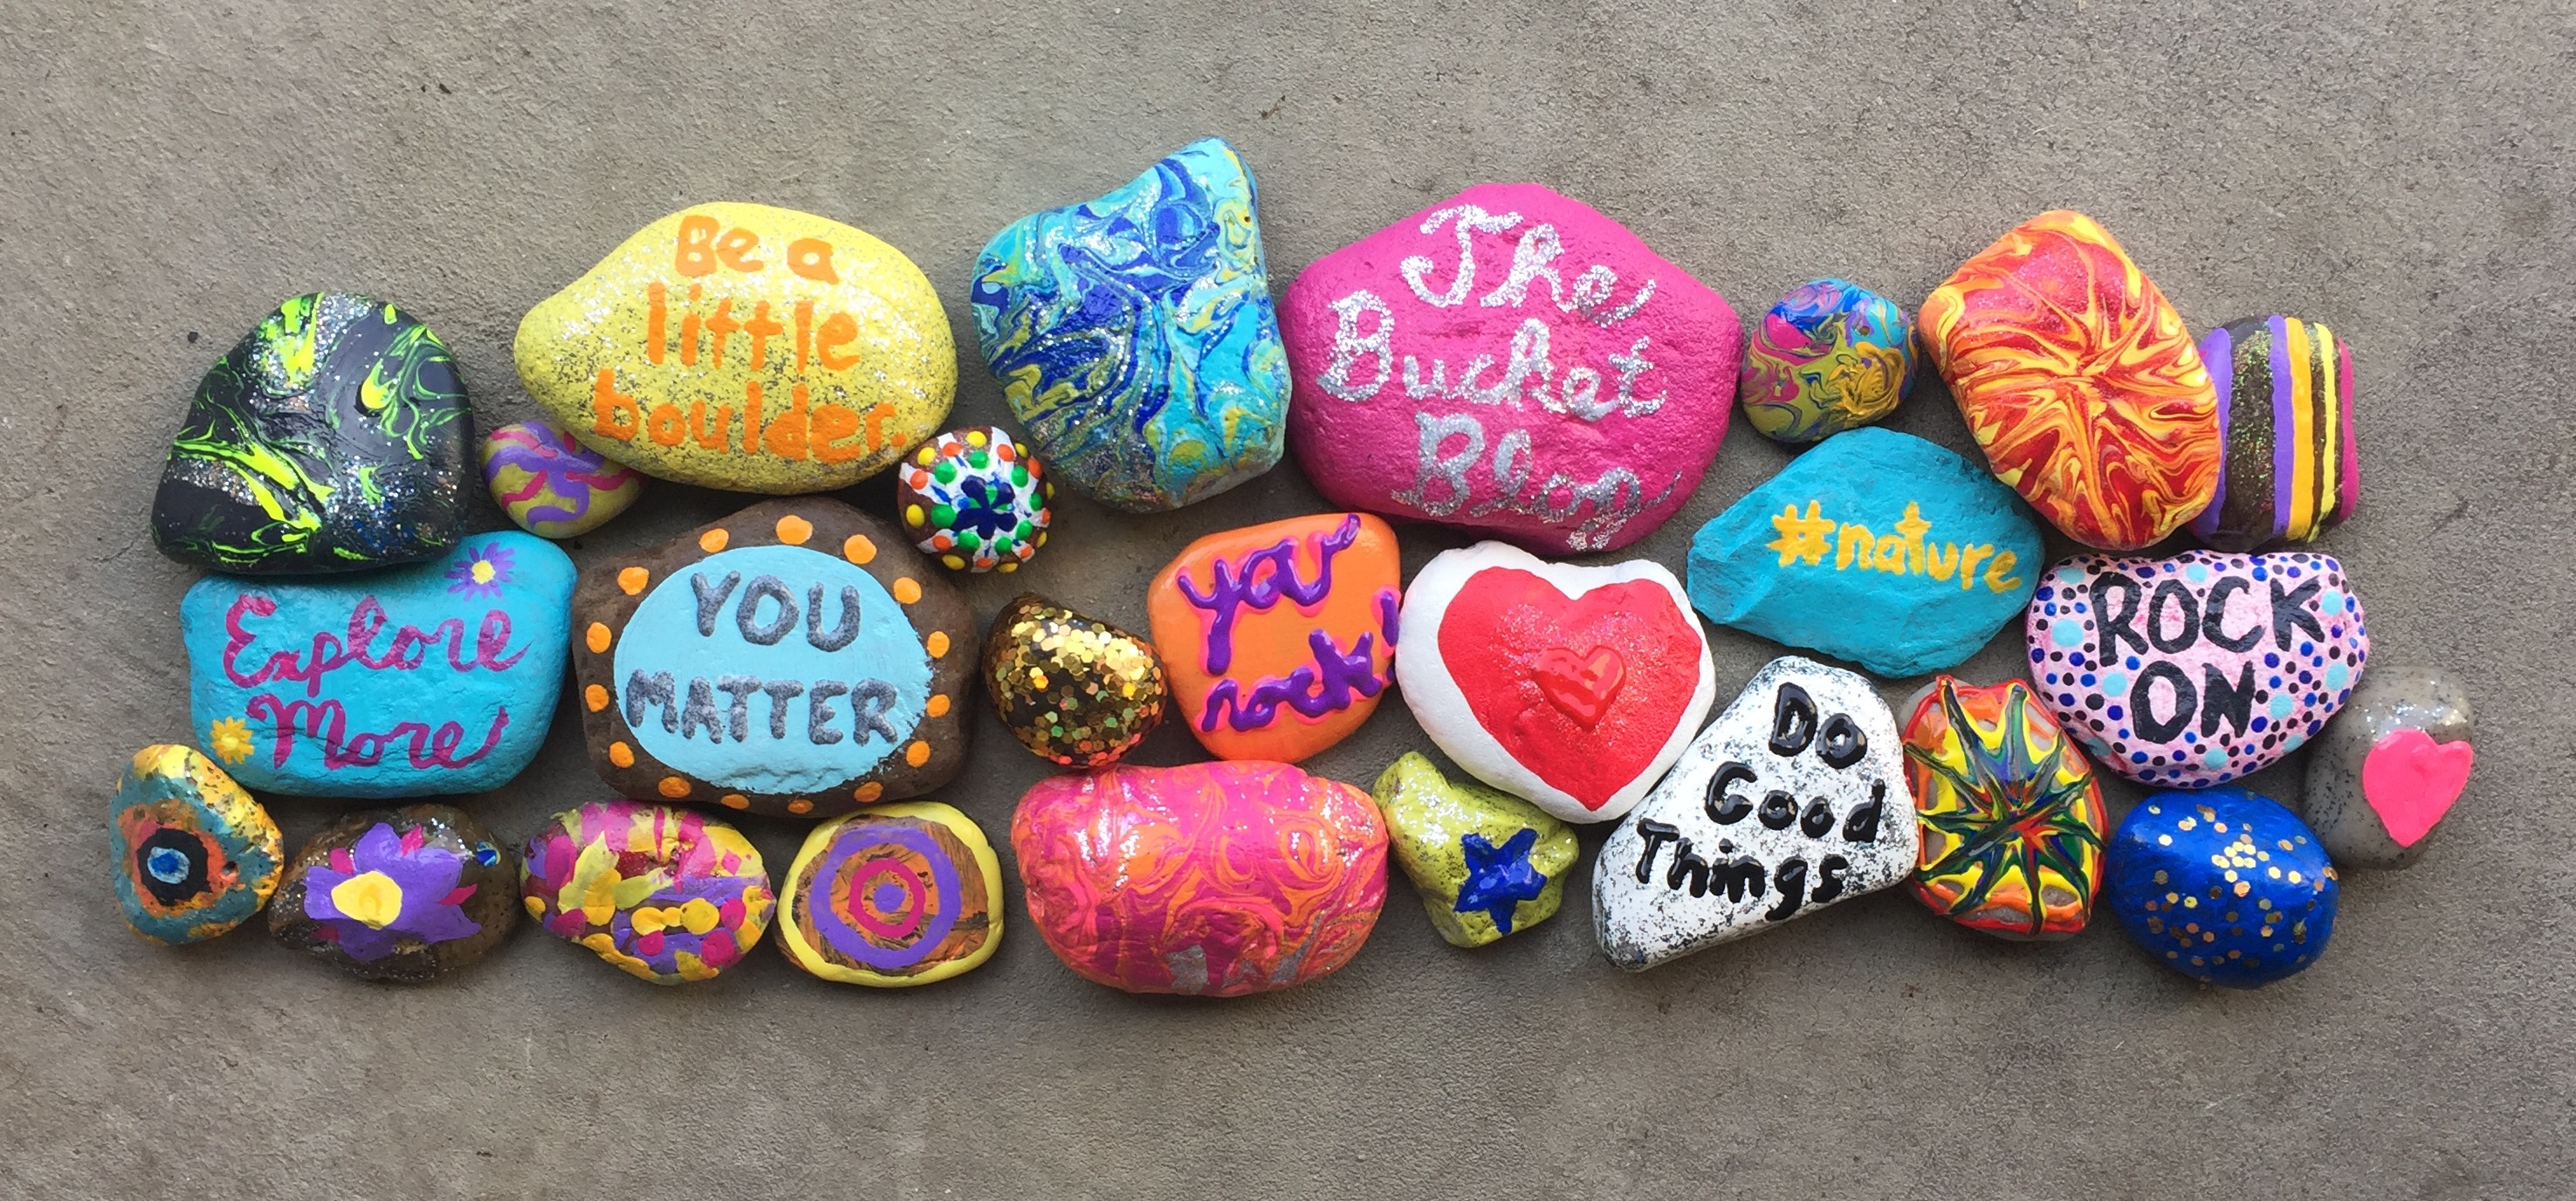 Rock Painting - The Buckit Blog